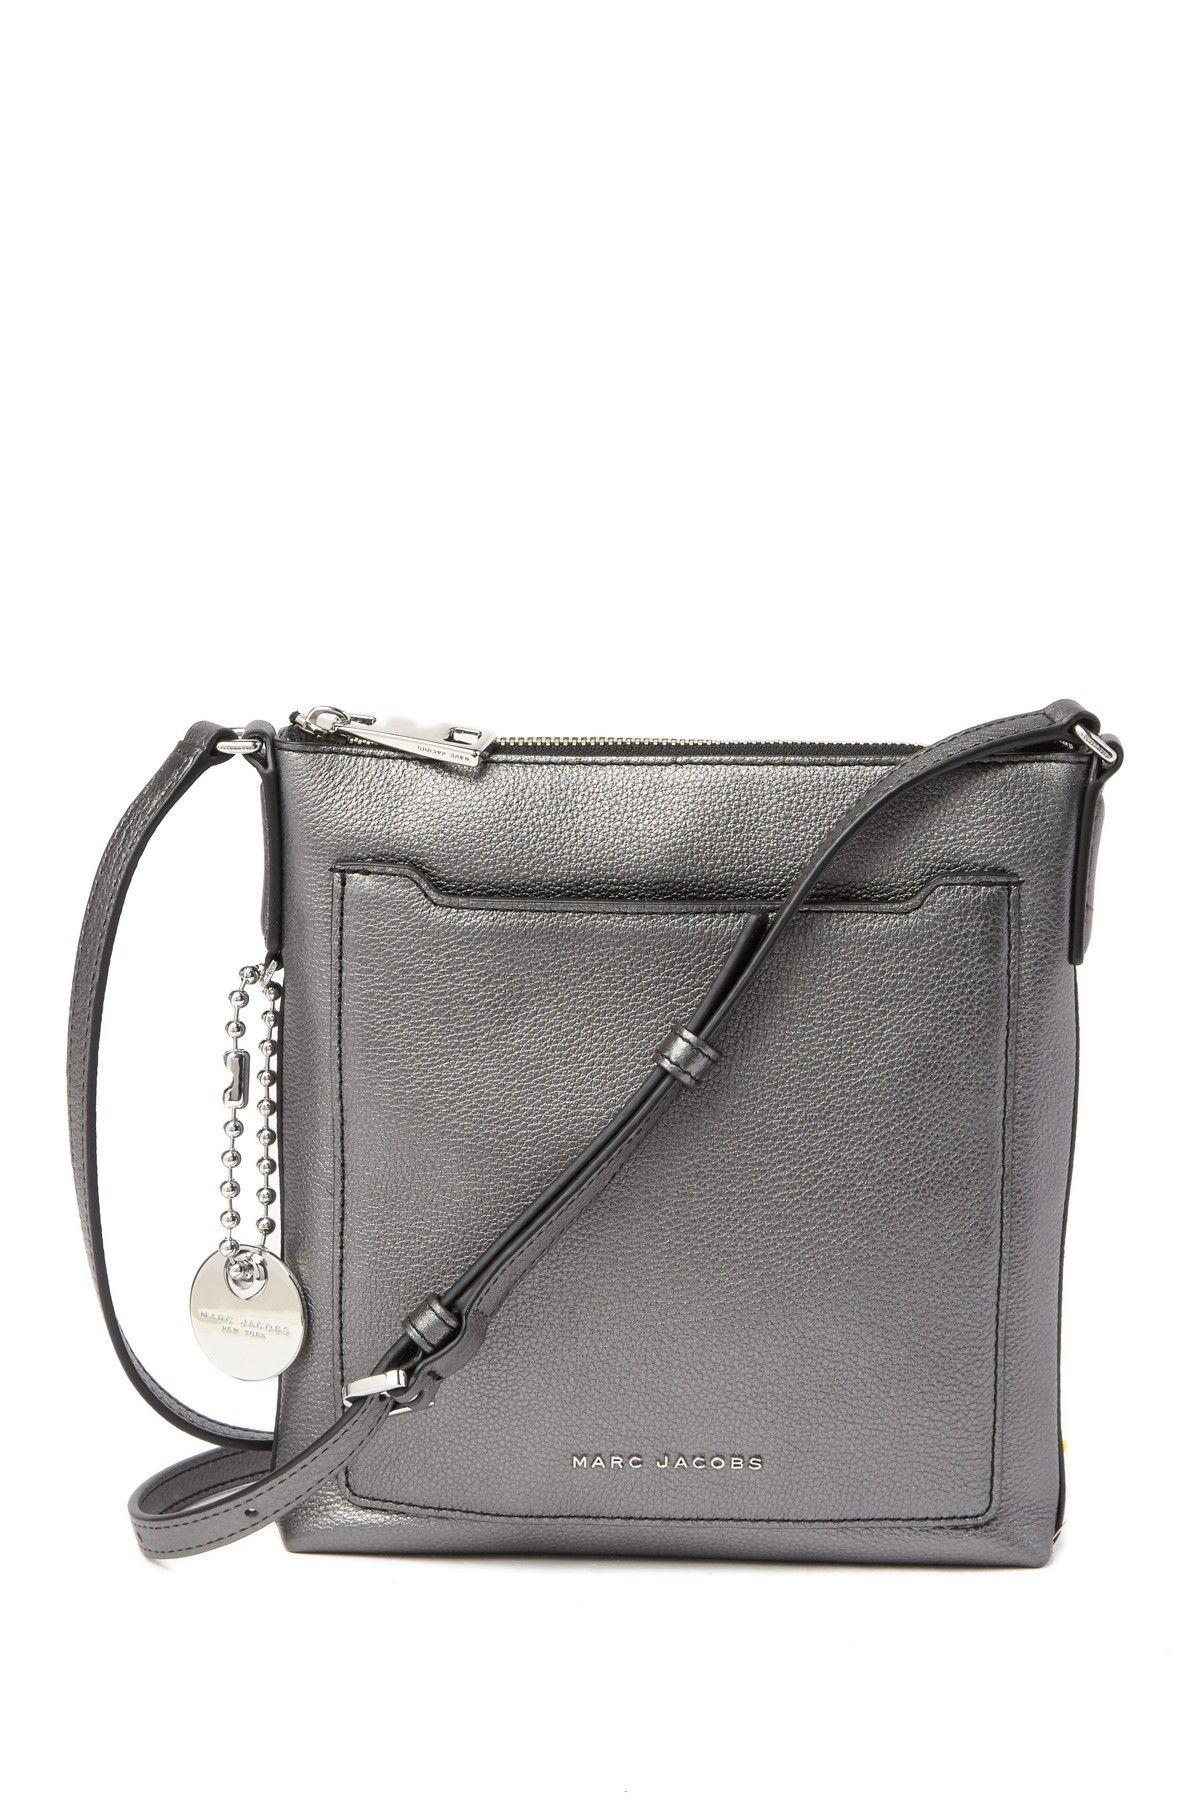 c0540383817 Marc Jacobs   Tourist Metallic Leather NS Crossbody Bag   Wish List ...